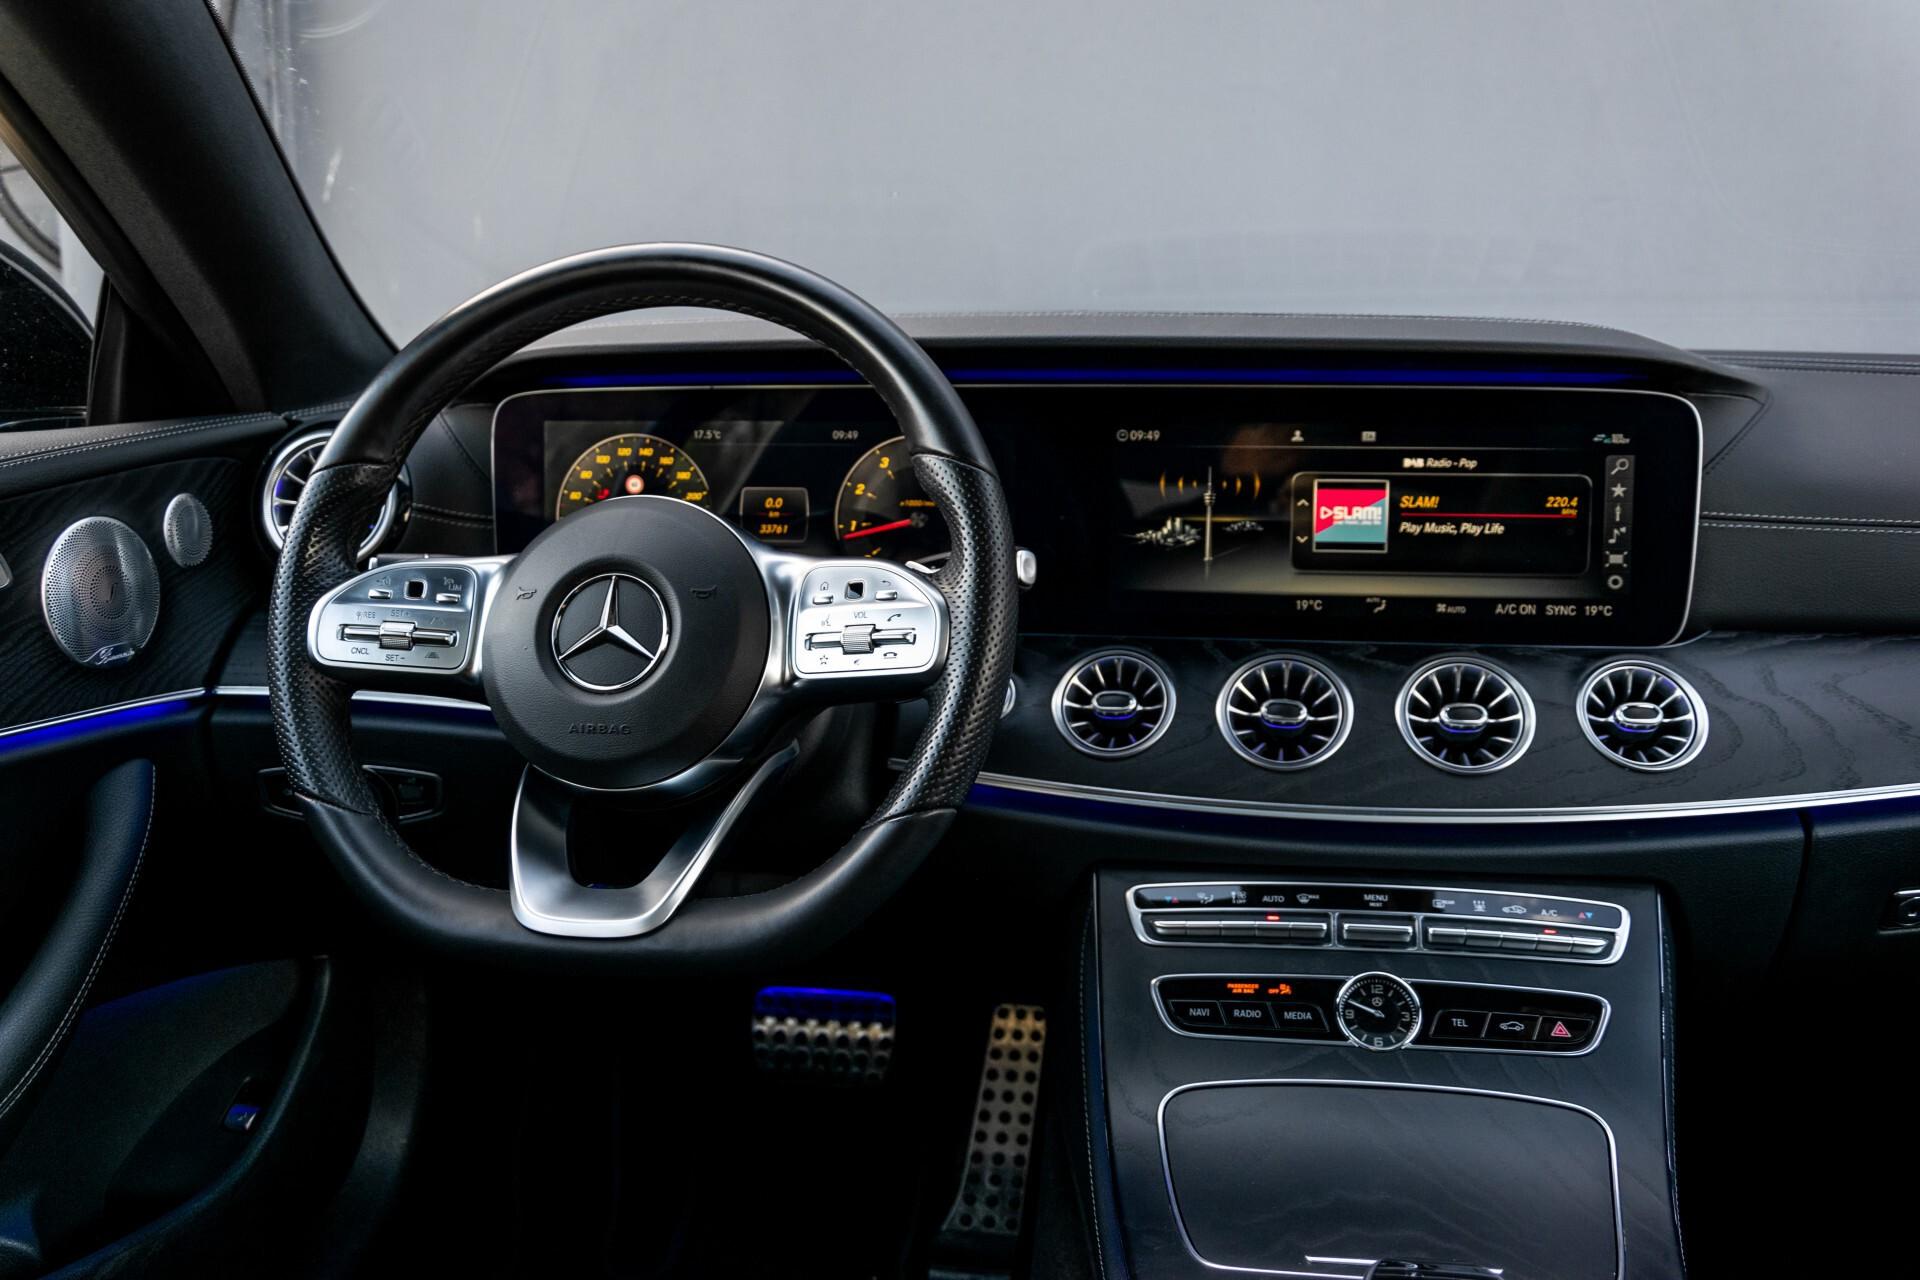 Mercedes-Benz E-Klasse Coupé 300 AMG Panorama/Rij-assist/Keyless/Massage/Memory/HUD/Standkachel/Night Aut9 Foto 4